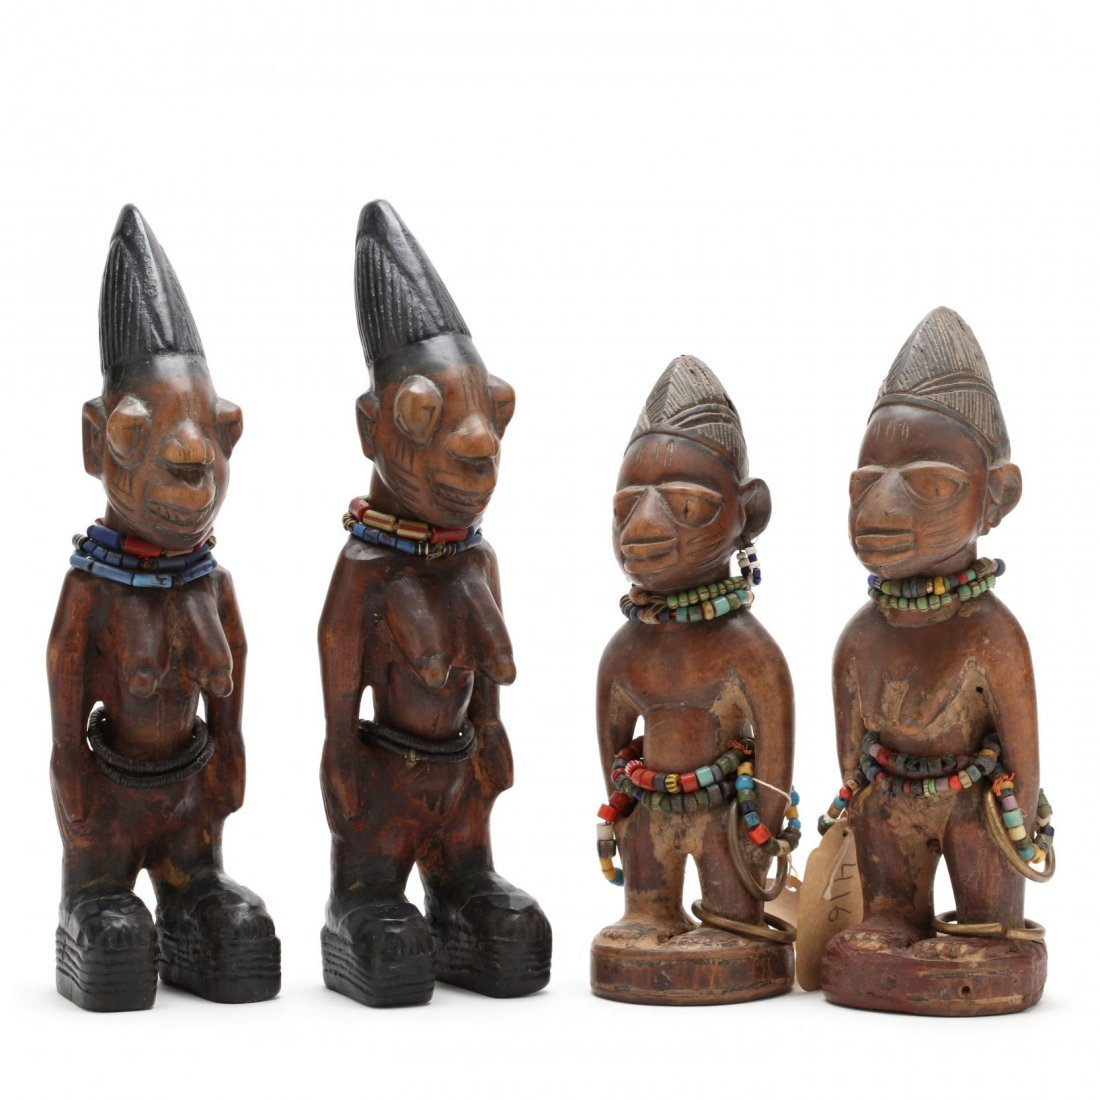 Nigeria, Two Sets of Yoruba Ibedji Twin Figures